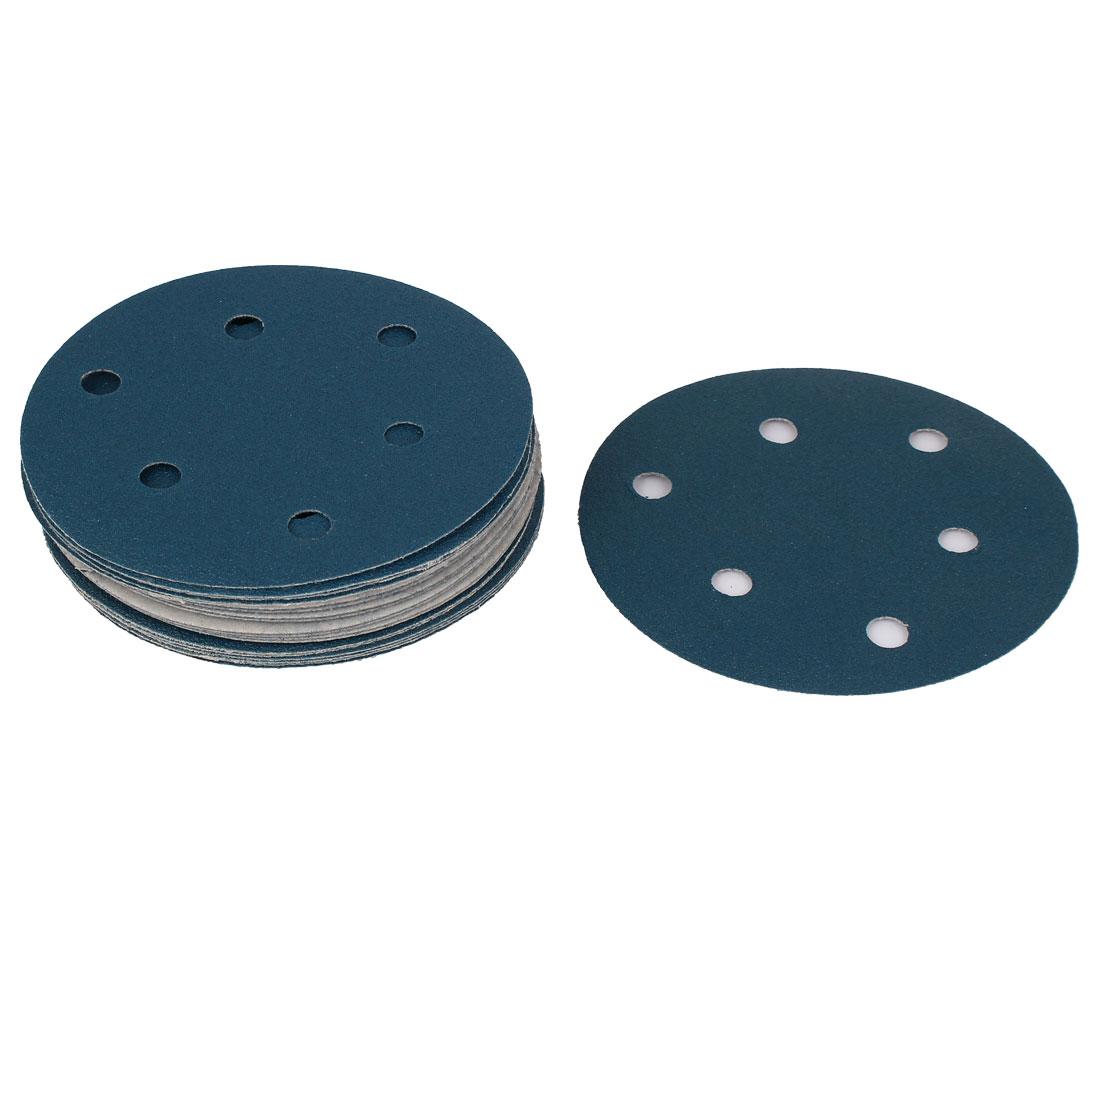 "5"" Sandpaper Auto Car Paint Polishing Sanding Disc Hook and Loop Fastener 6 Holes 100 Grit 20pcs"